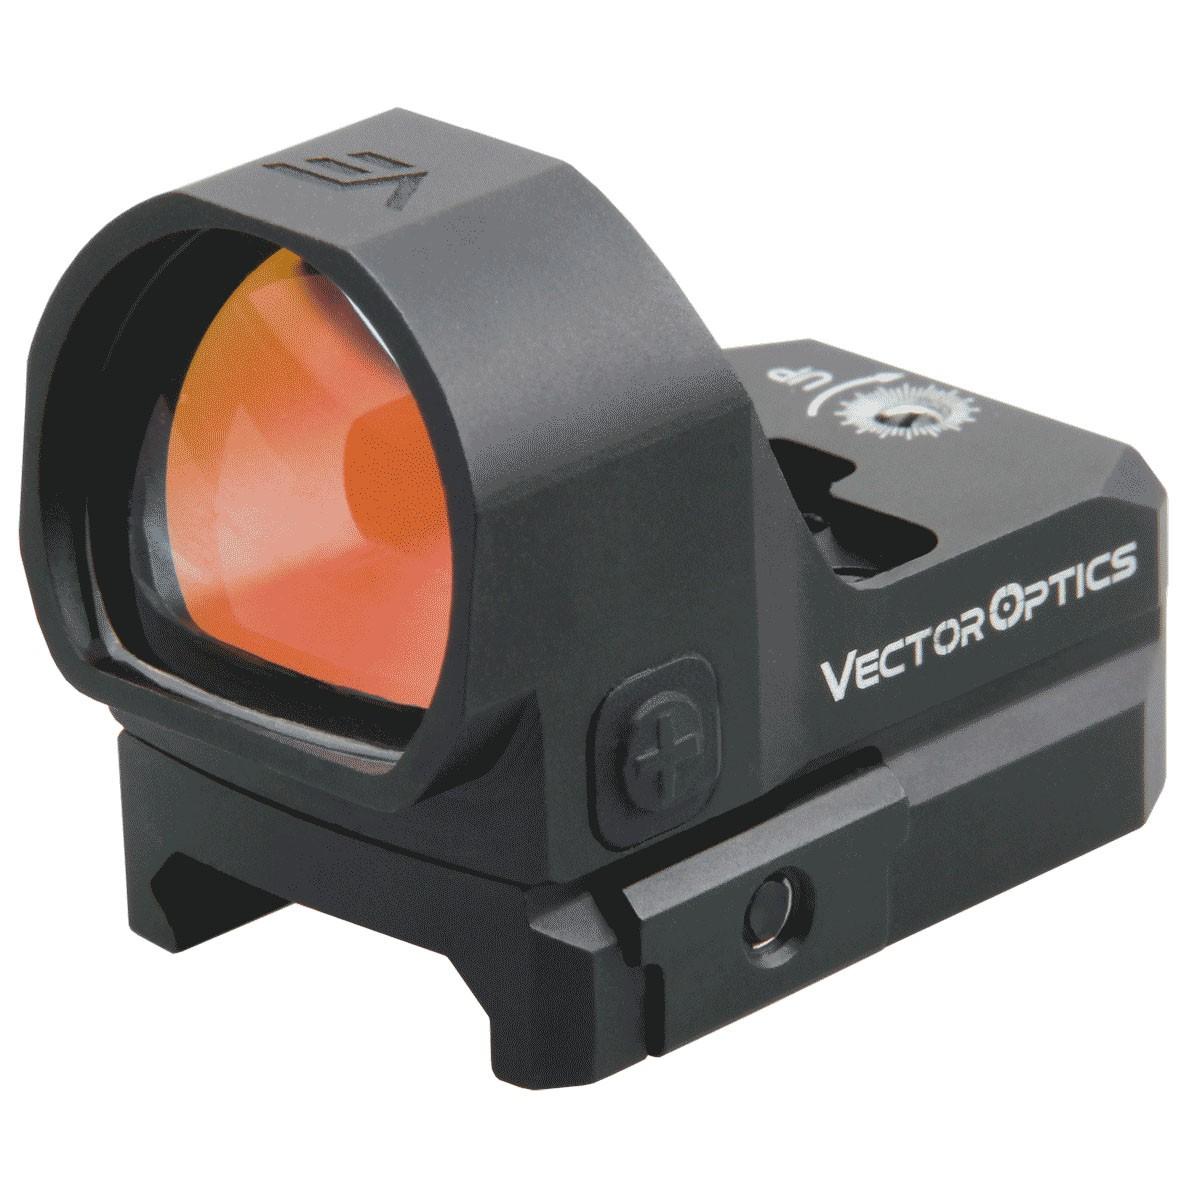 Vector Optics SCRD-36 FRENZY 1x22x26 MOS Motion Sensor